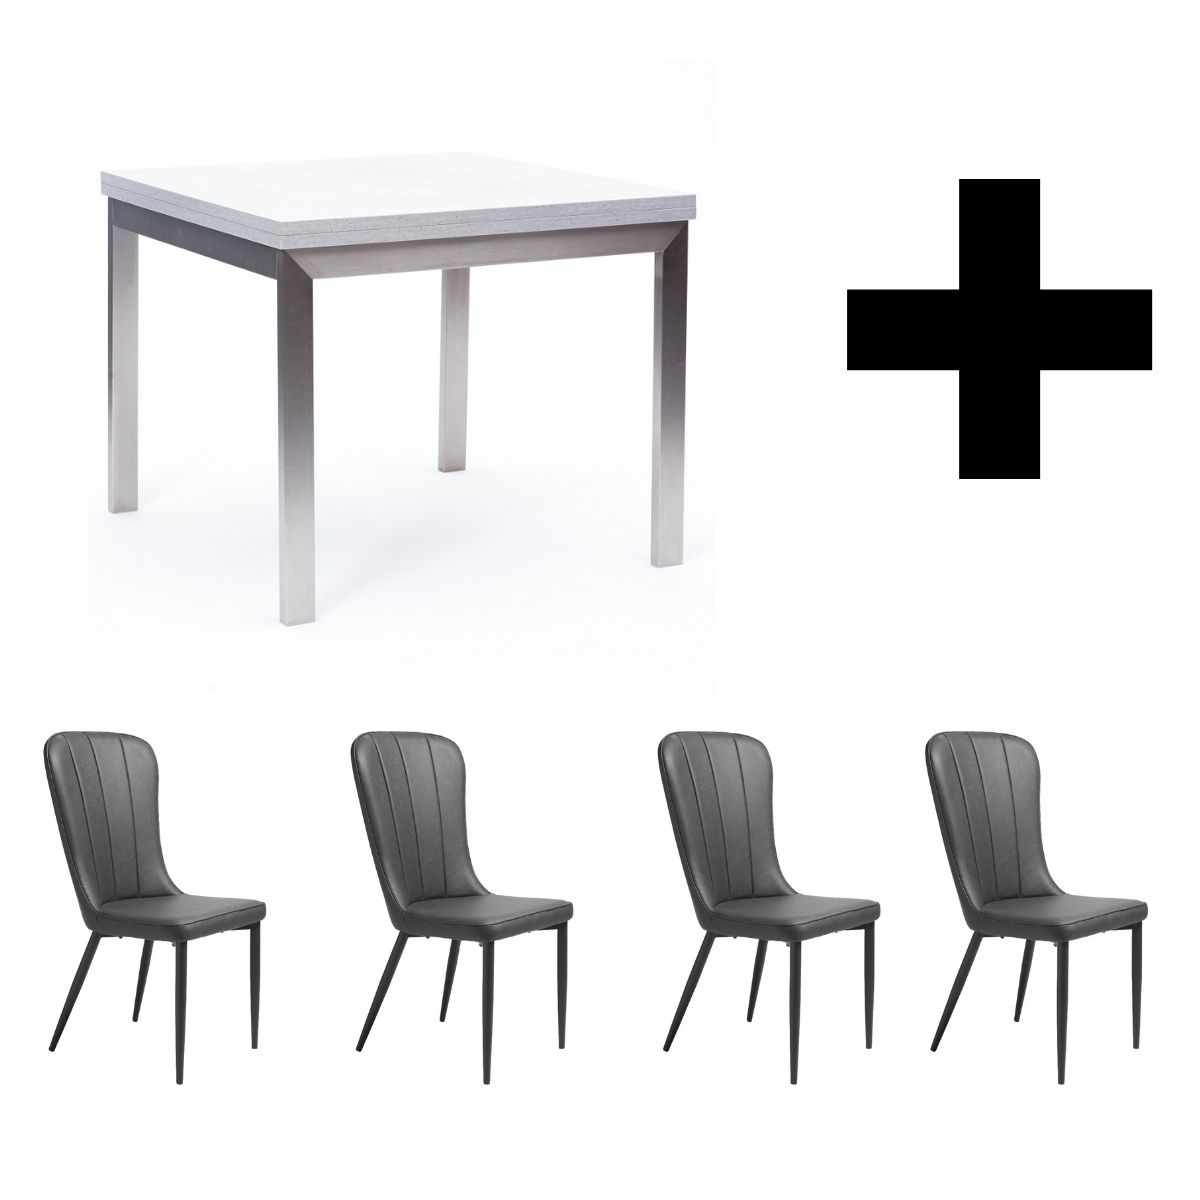 Hornby Flip Top Table and 4 Effie Vintage Grey Chairs - Bundle Deal